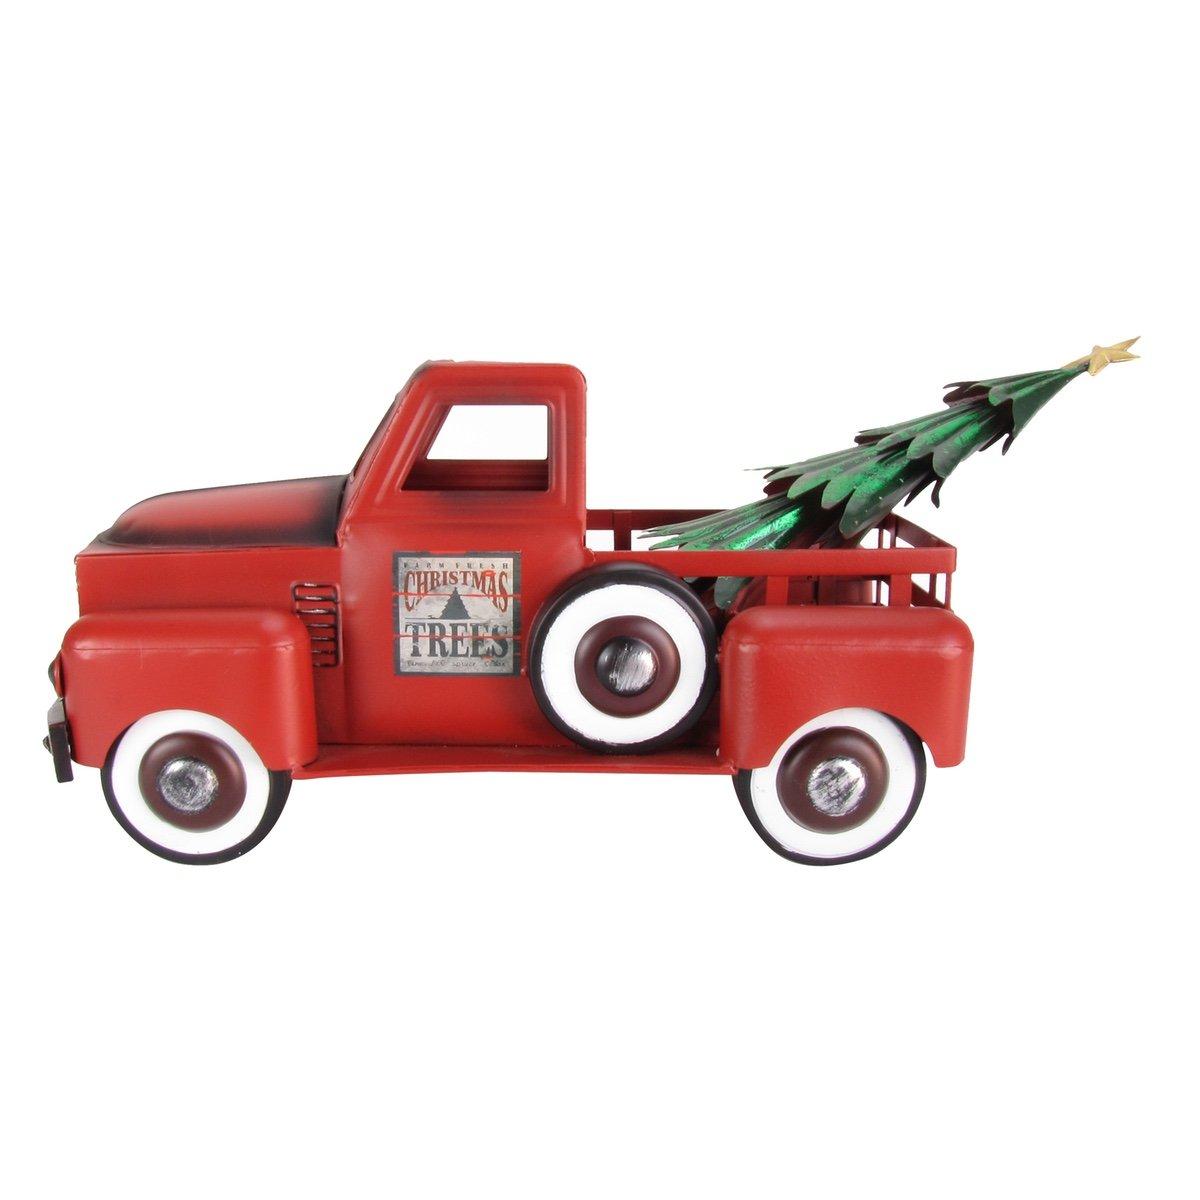 TreasureGurus, LLC Red Metal Christmas Tree Farm Delivery Pickup Truck Toy Decoration by TreasureGurus, LLC